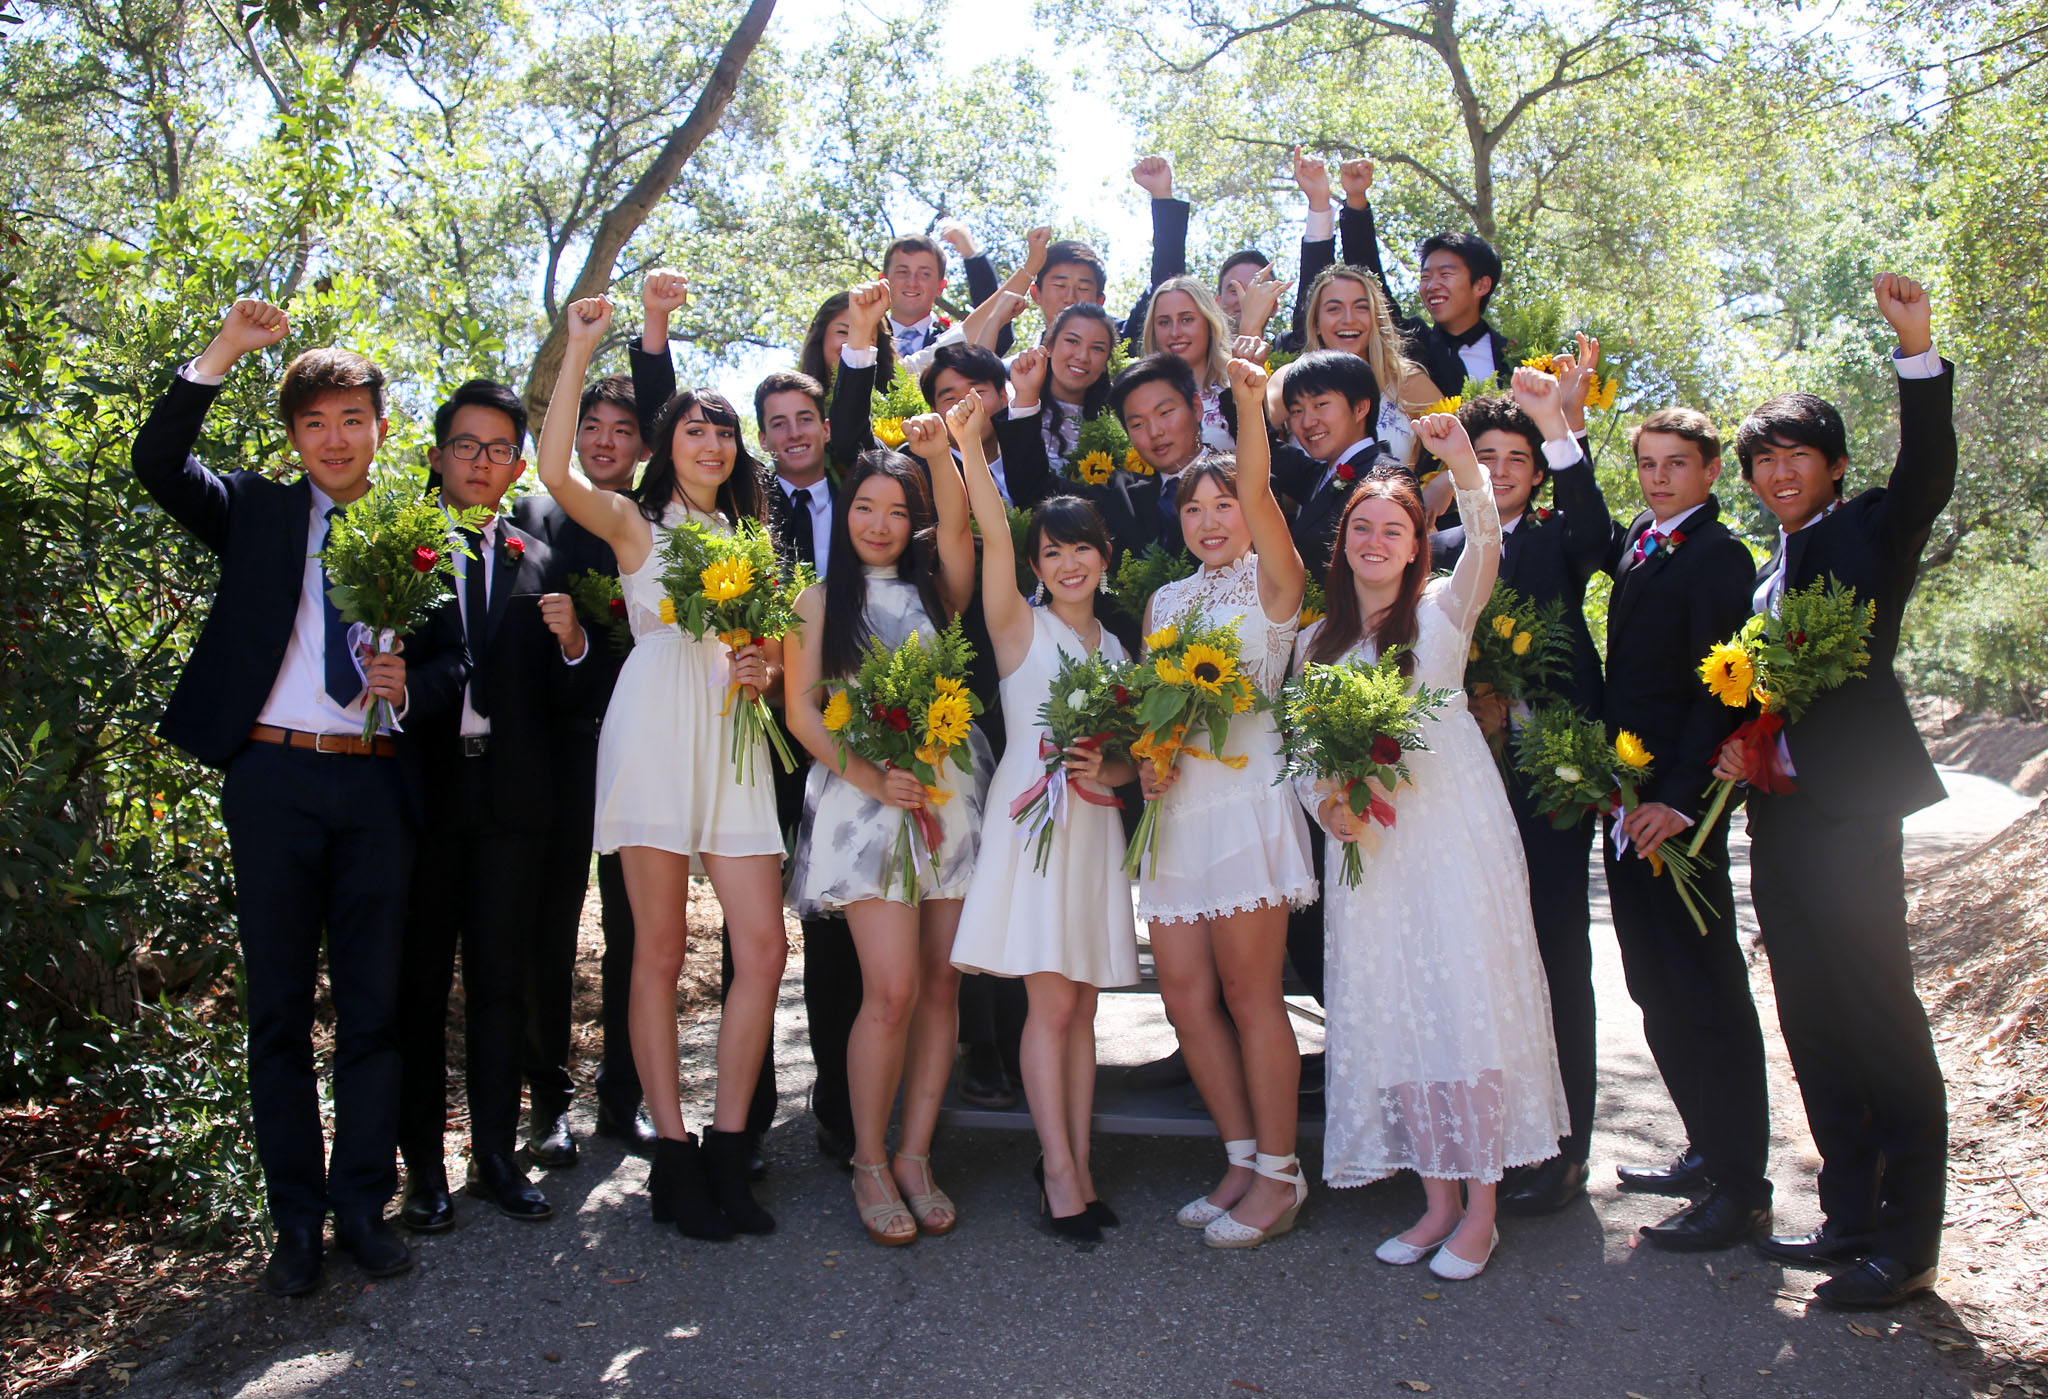 Congrats Class of 2016